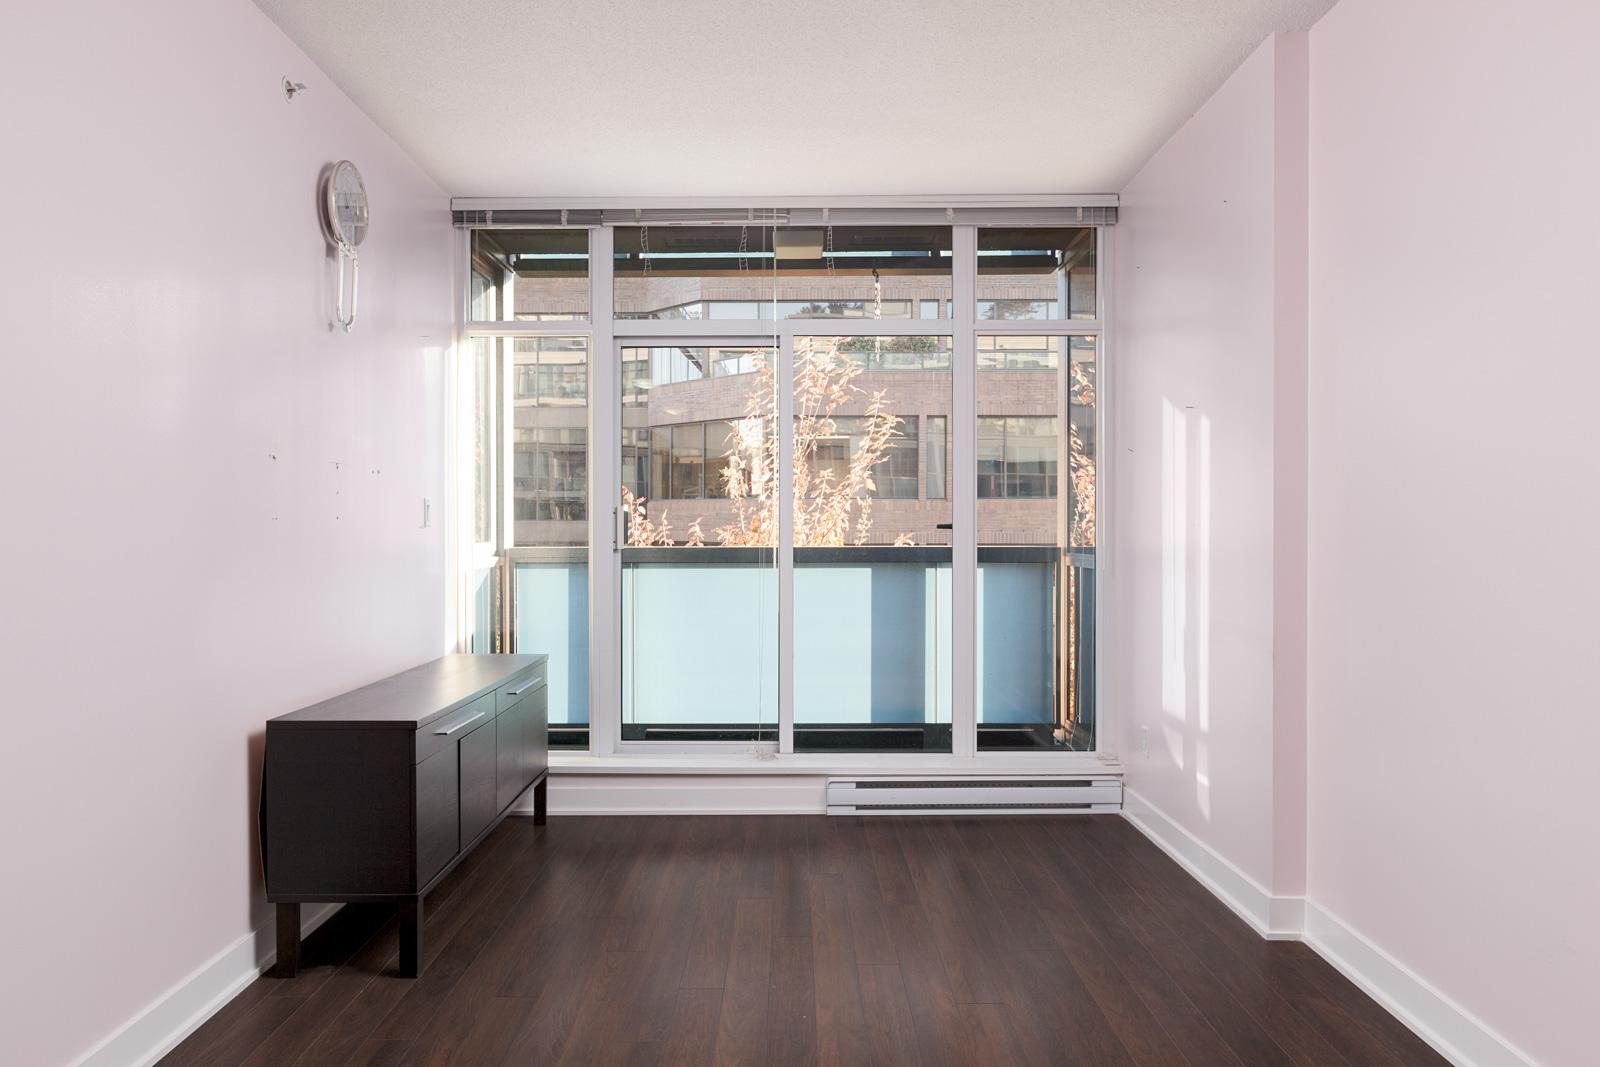 Living room with windows and dark hardwood floors in Kits360 condo rental